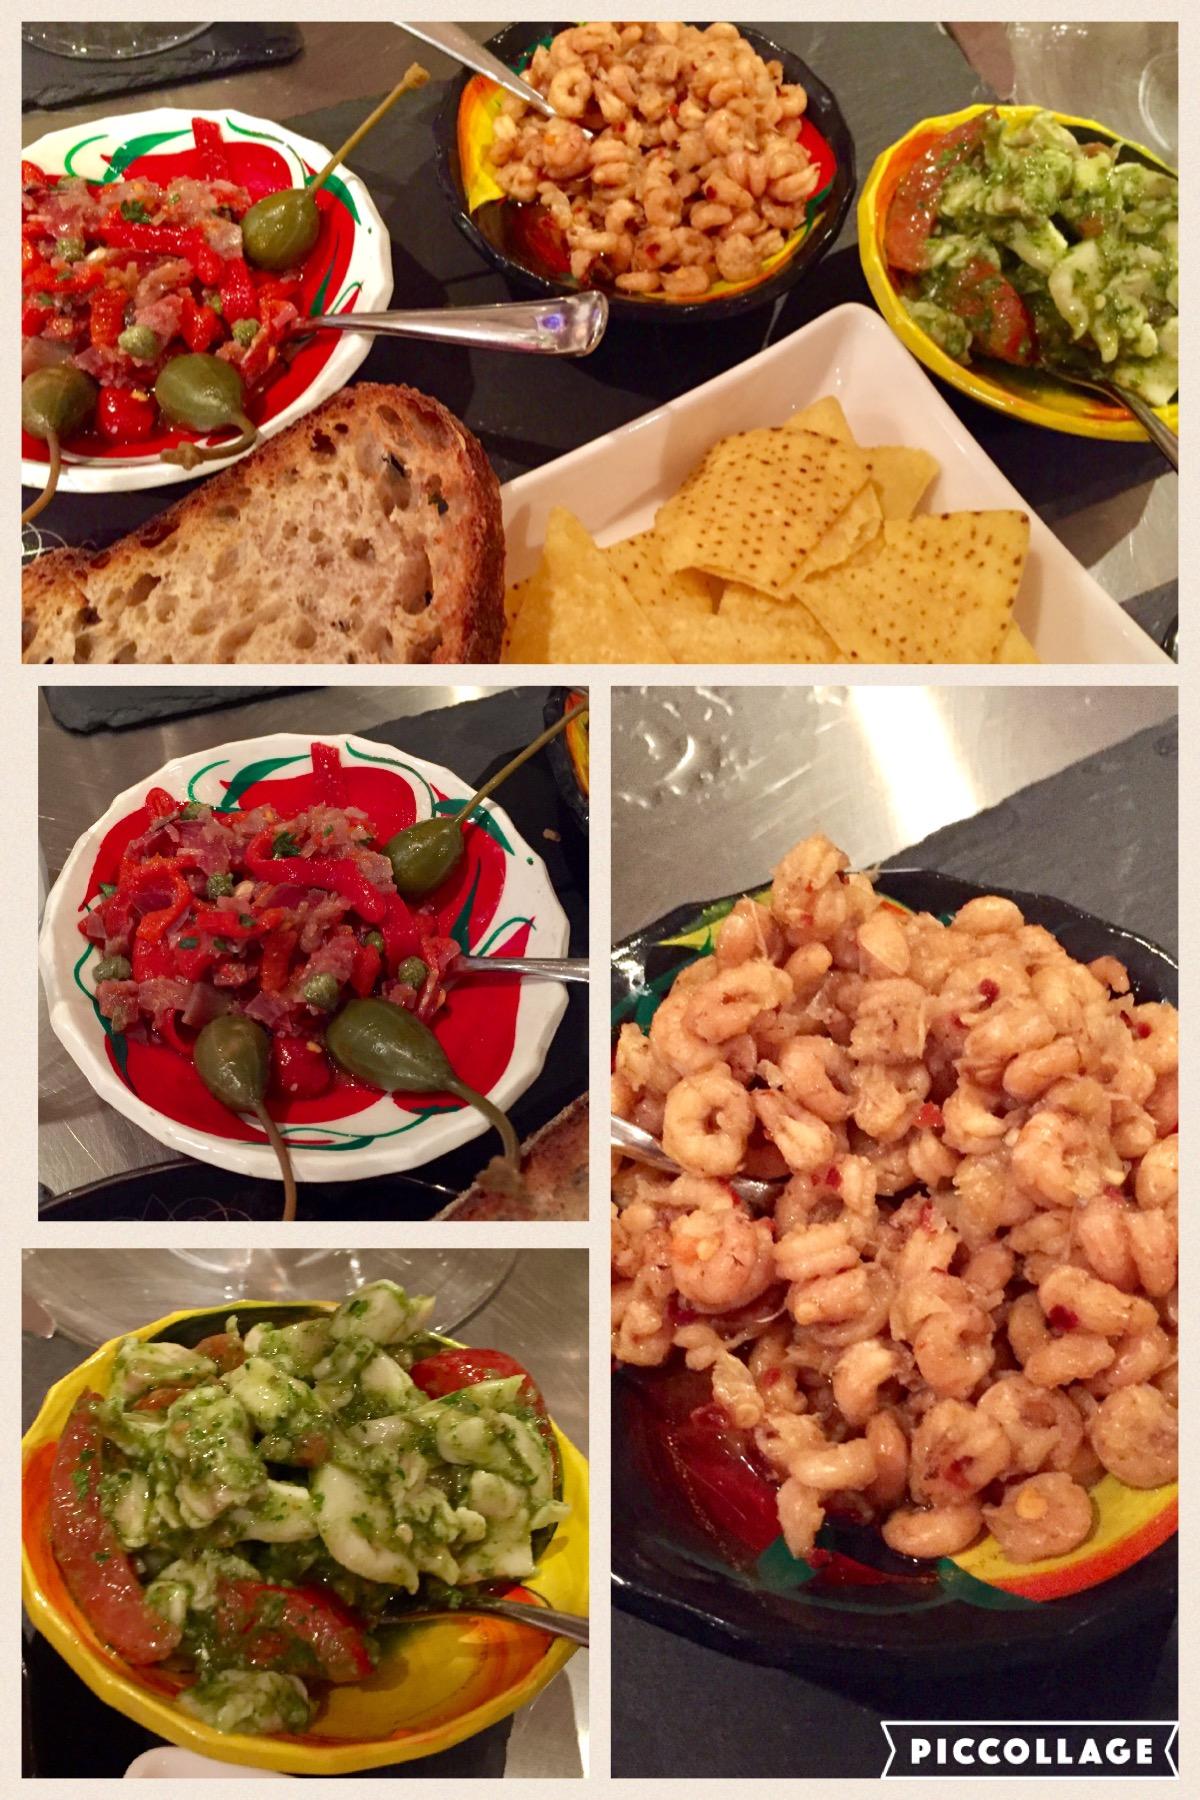 Green Ceviche, Tortilla, Morecambe Bay shrimp piri peri, Mojama, piquillo pepper, caper berries, rye sour dough toast and butter